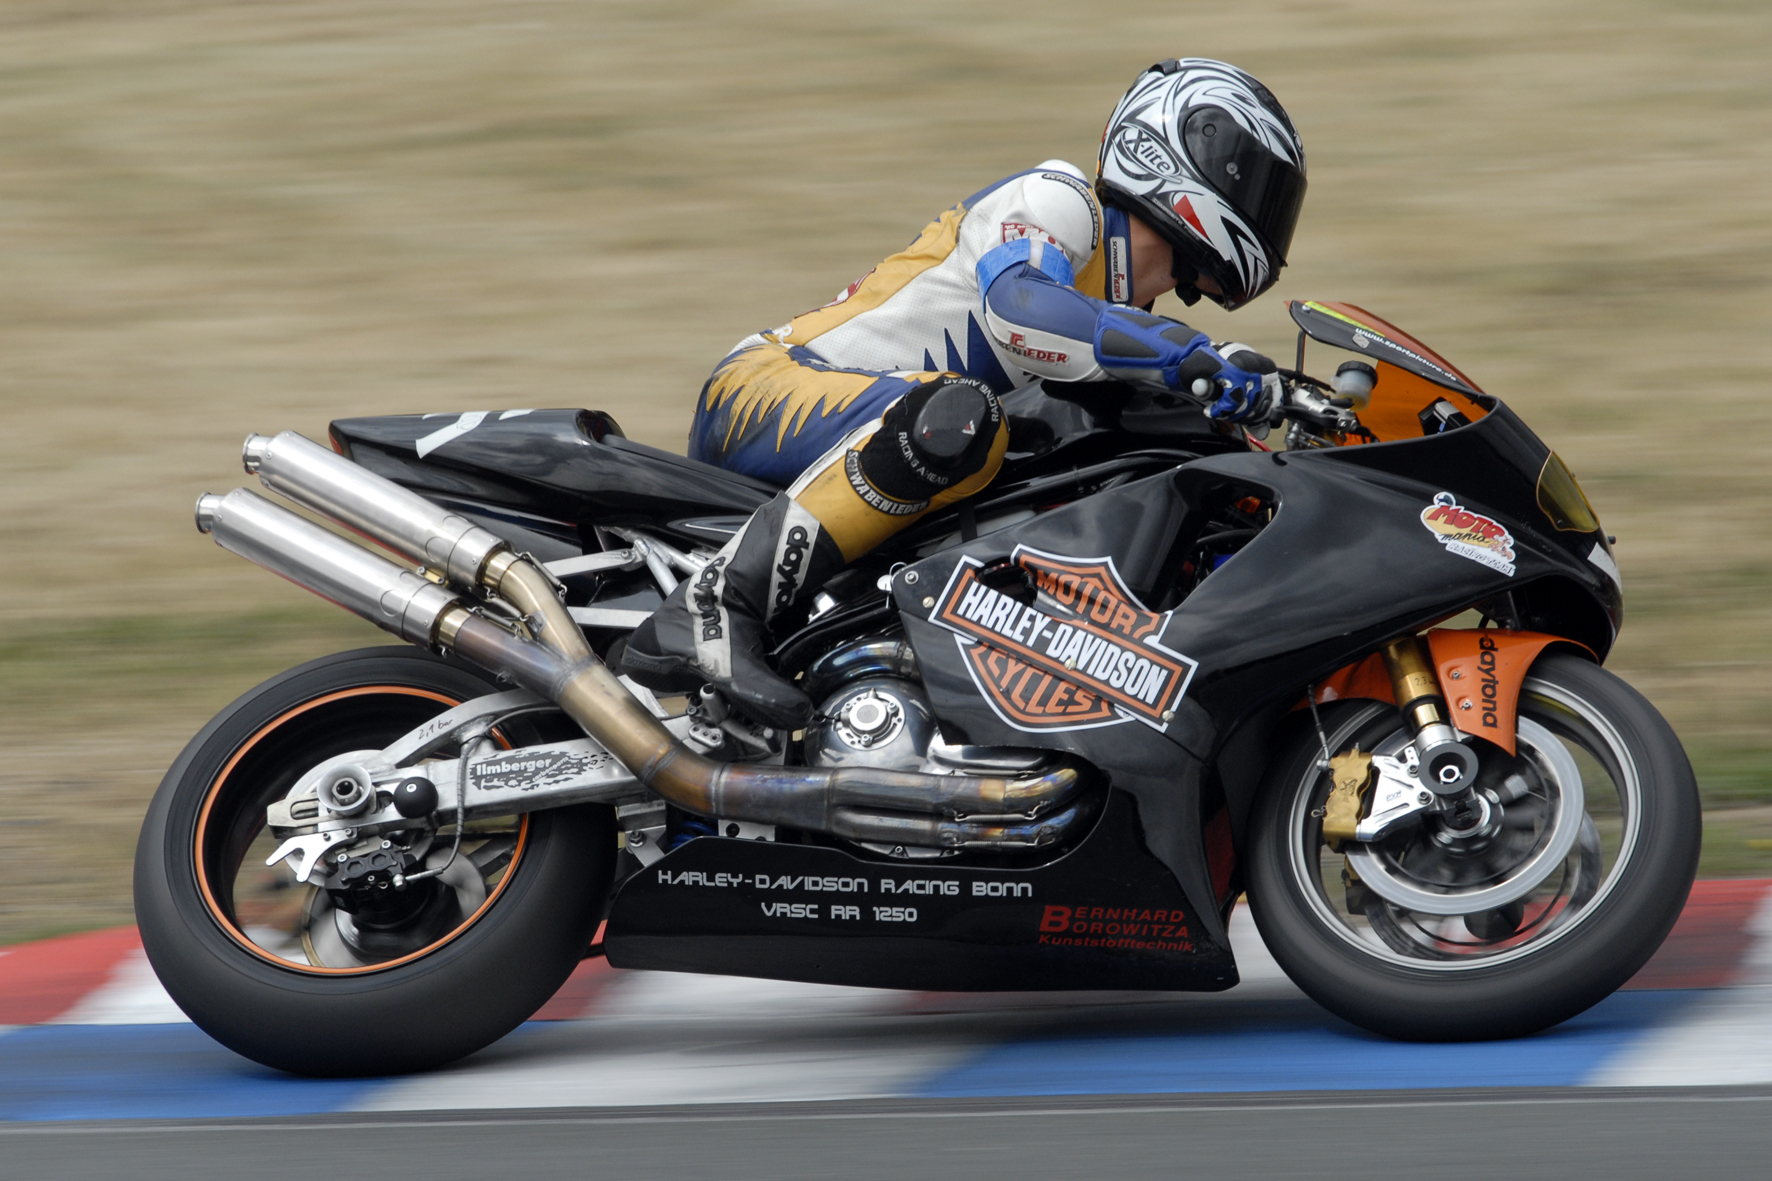 Harley-Davidson VRSC-RR